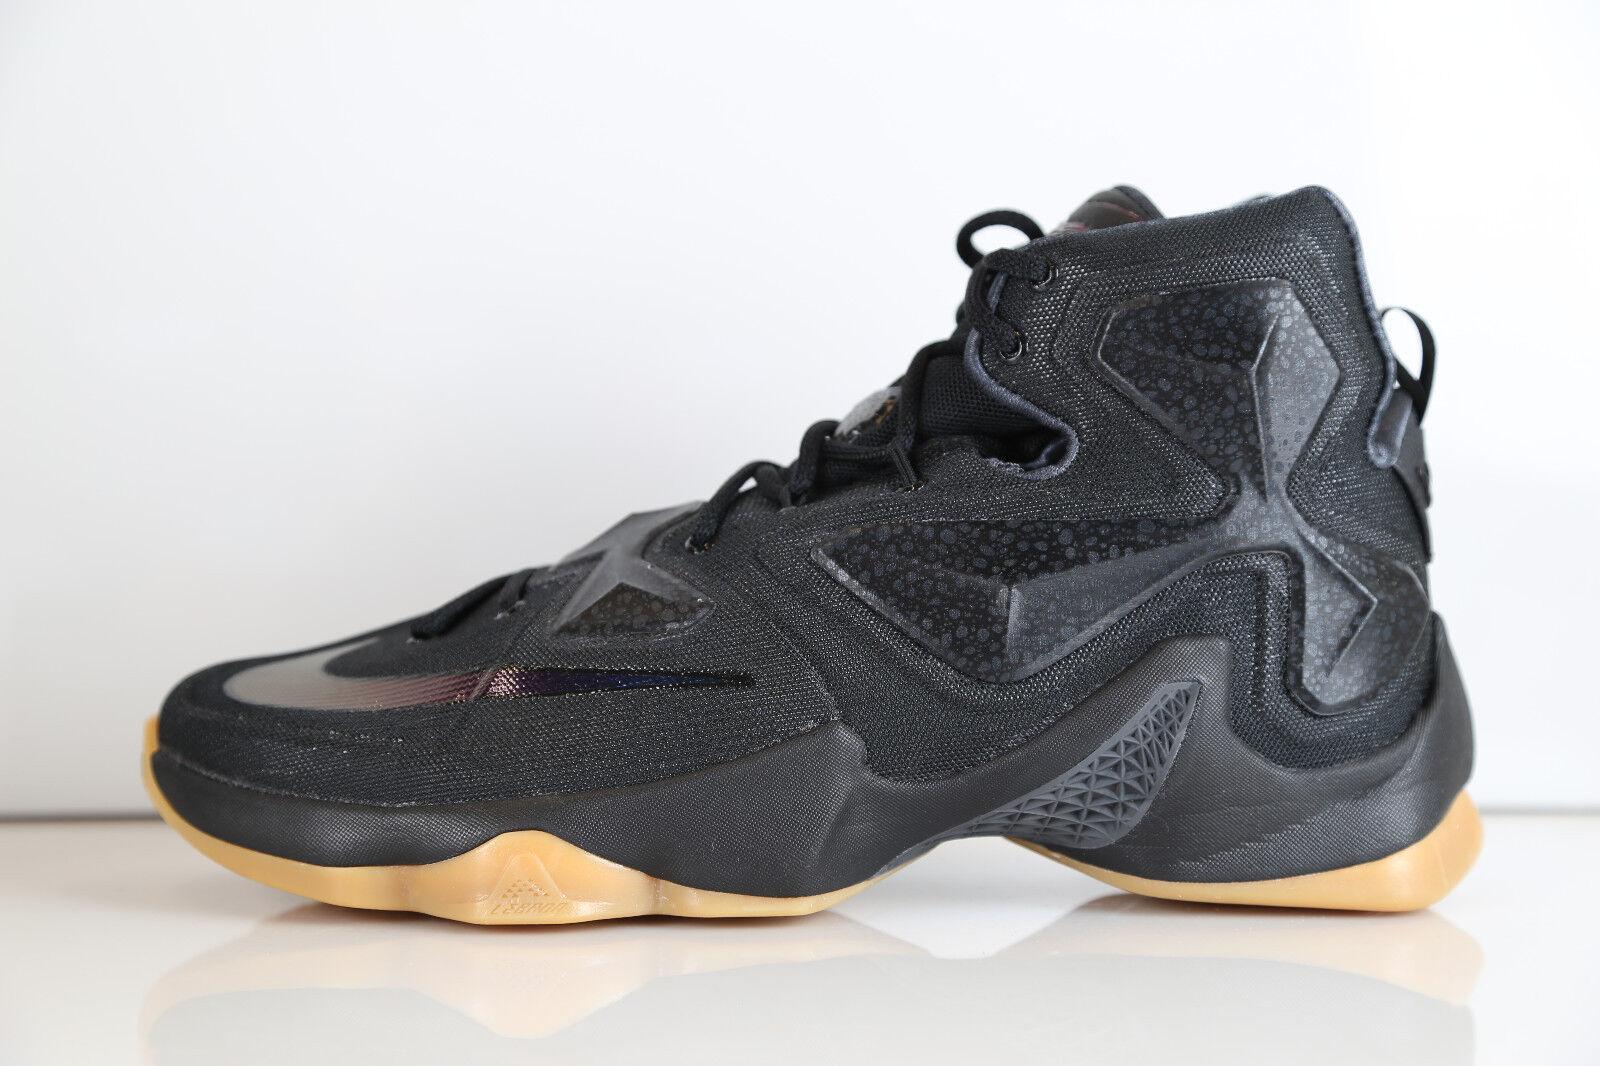 Nike Lebron 13 Noir Carbon Fiber 10 Anthracite 807219-001 8-13 11 10 Fiber supreme c43da0